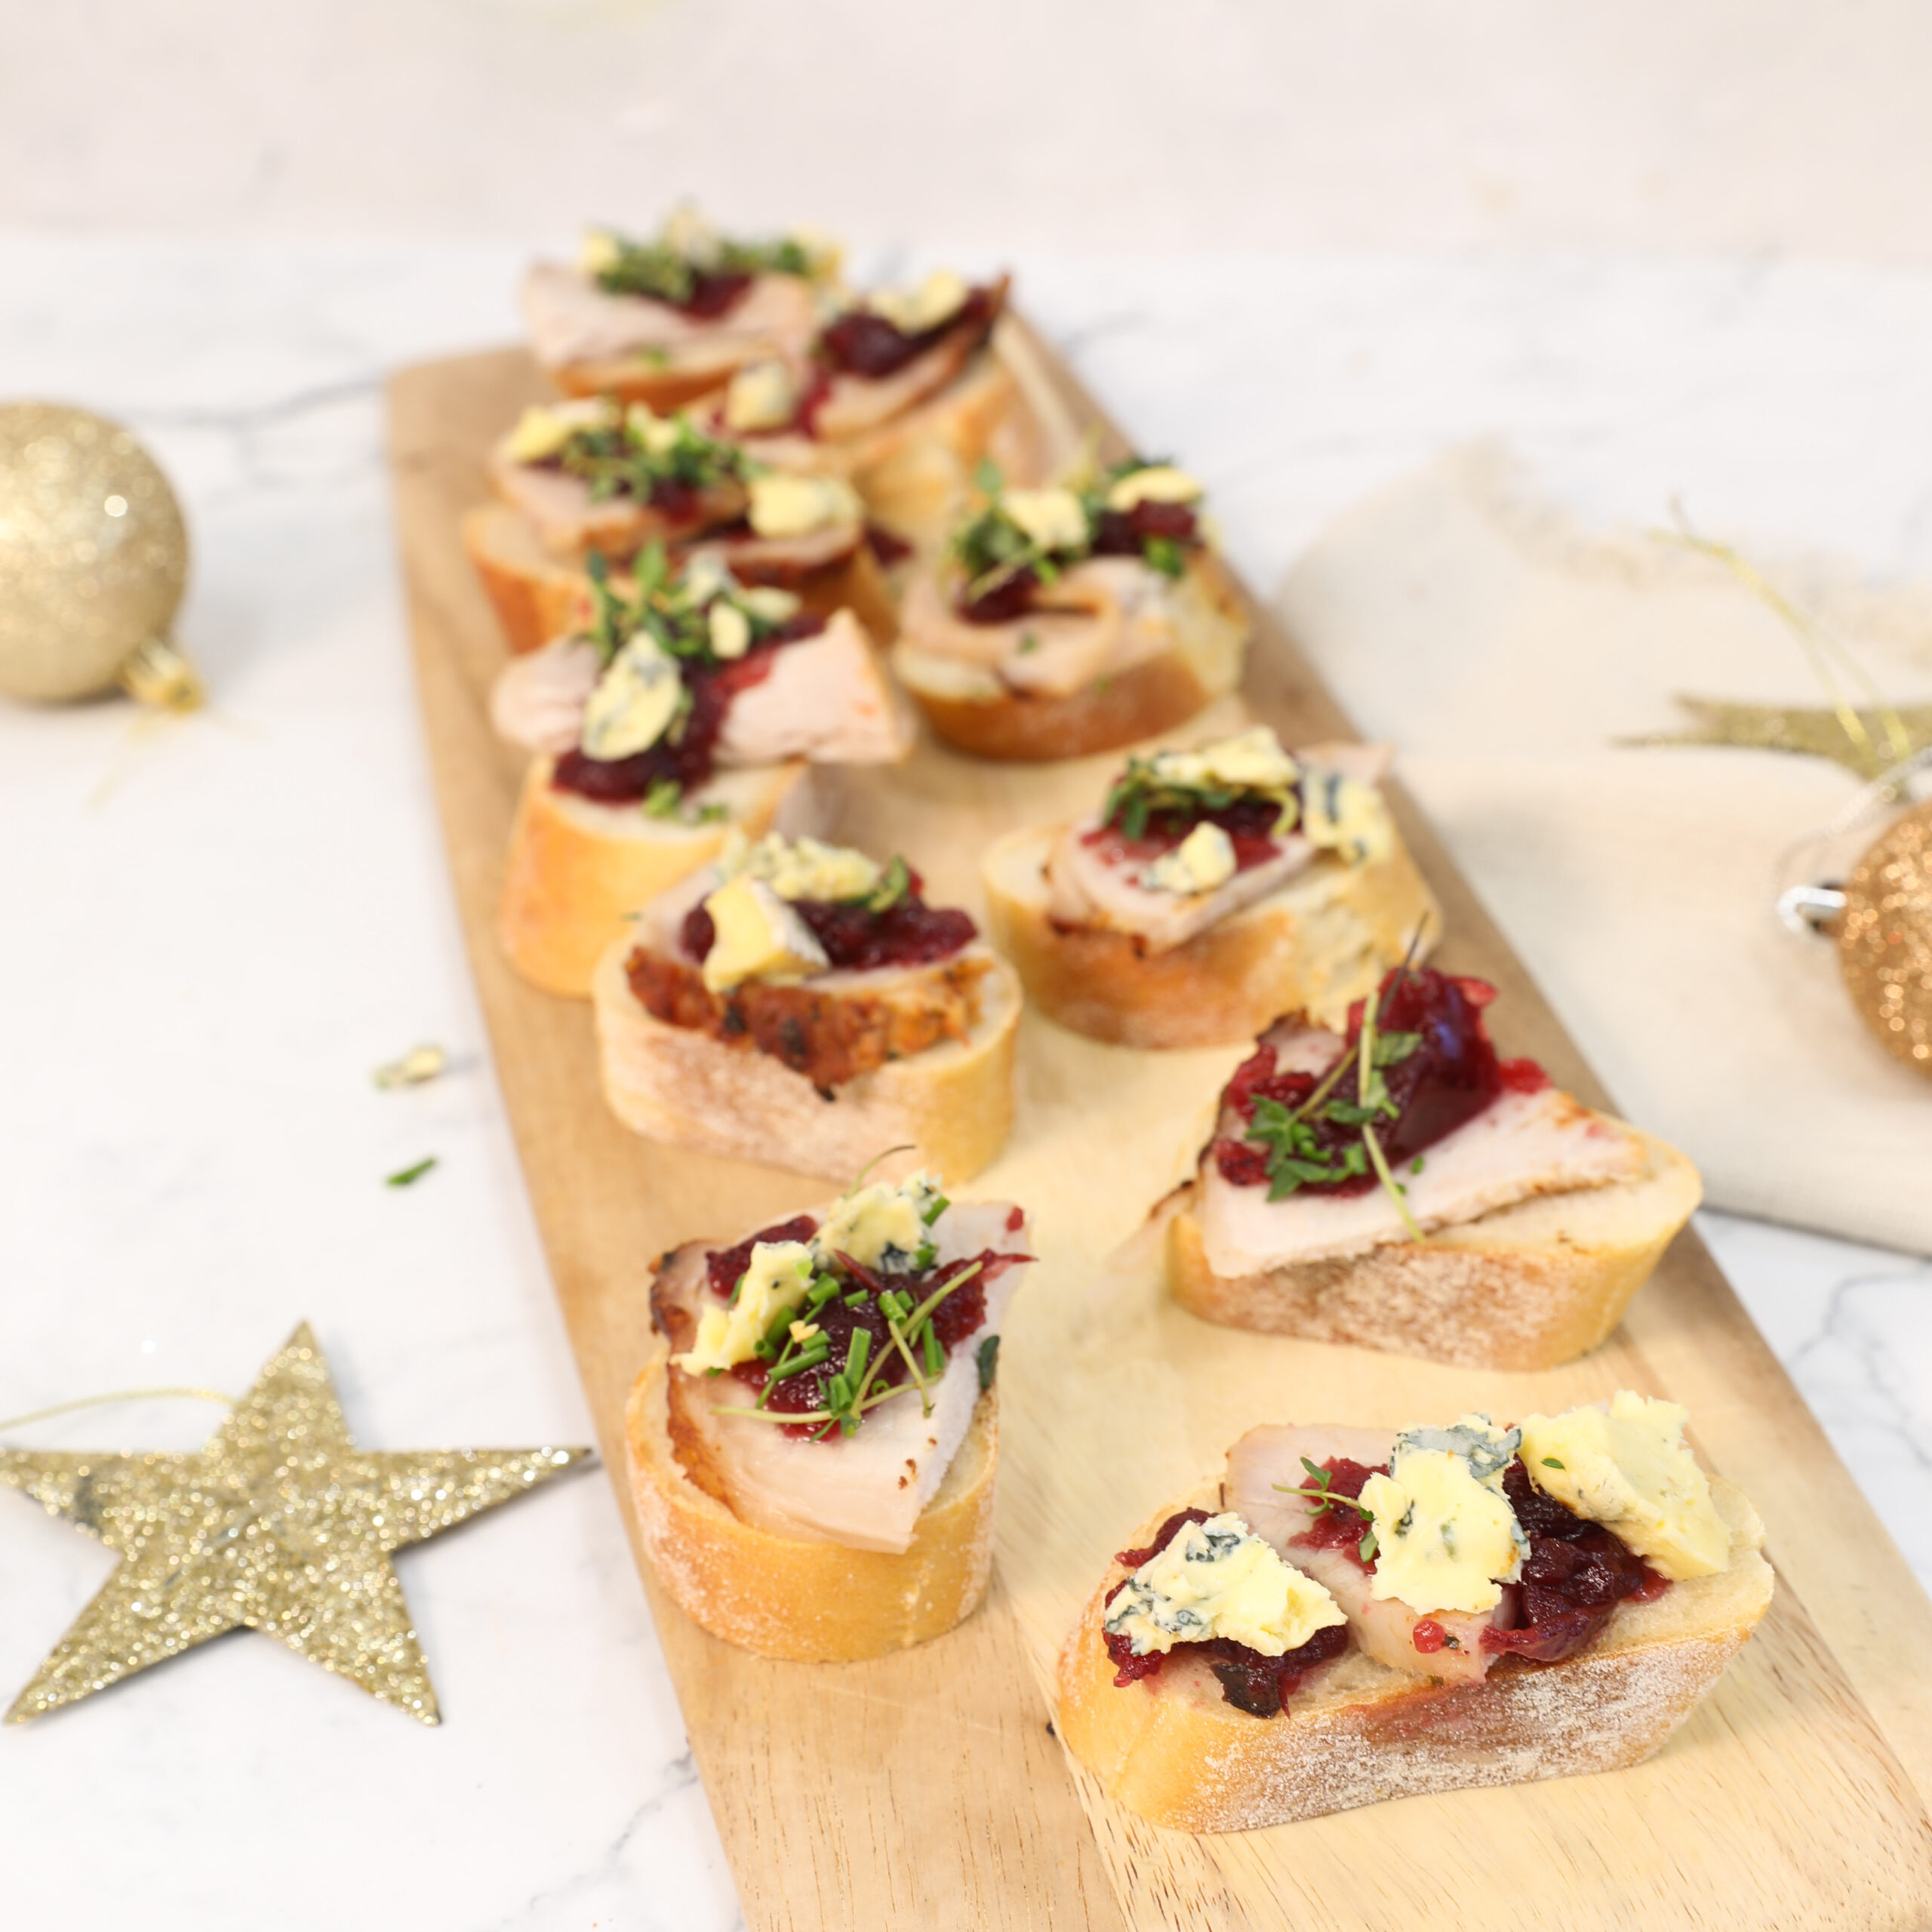 Roast Pork and Cranberry Bruschetta - Leg Roast